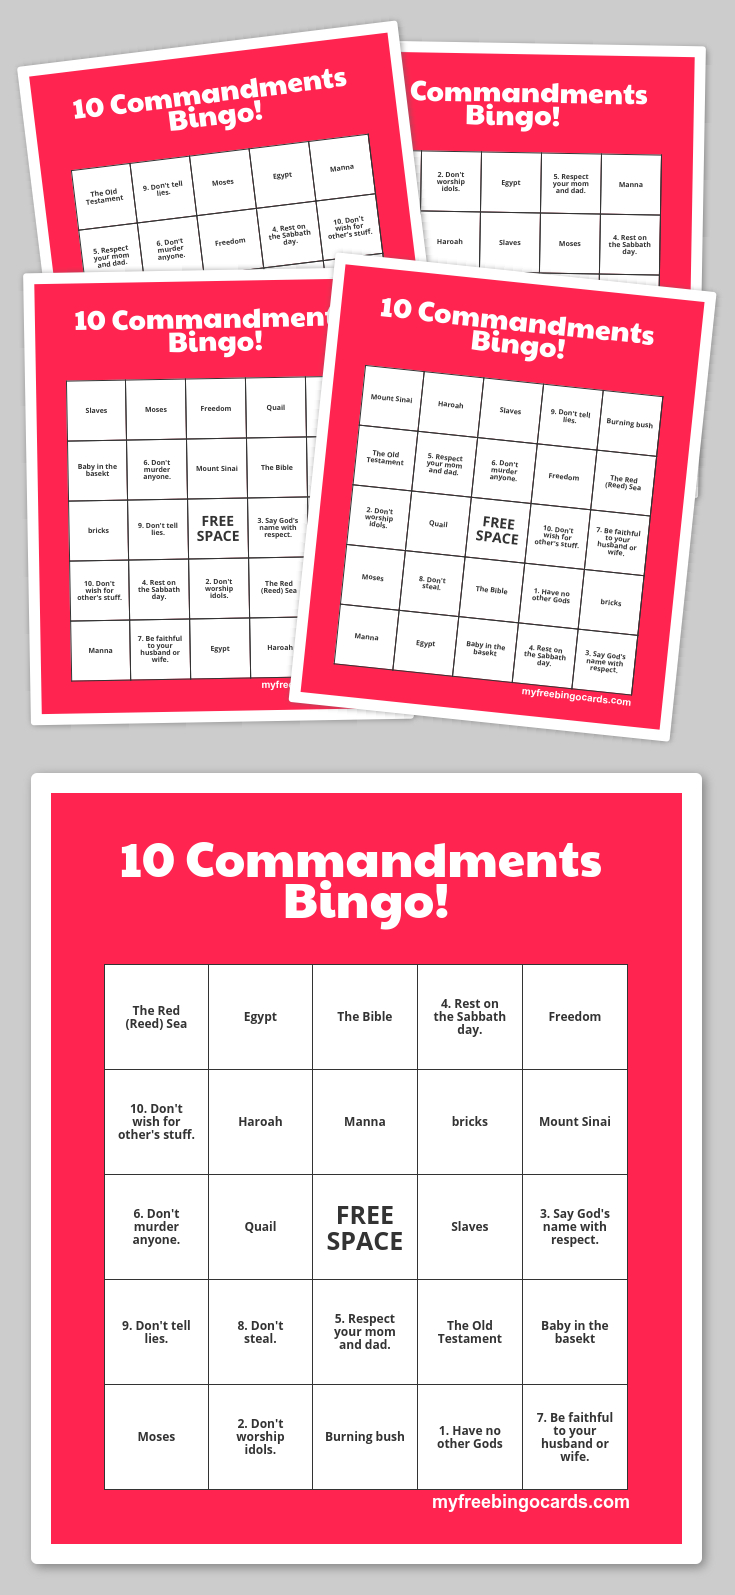 Free Printable Bingo Cards   The 10 Commandments   Sunday School - Free Printable Bible Bingo For Preschoolers